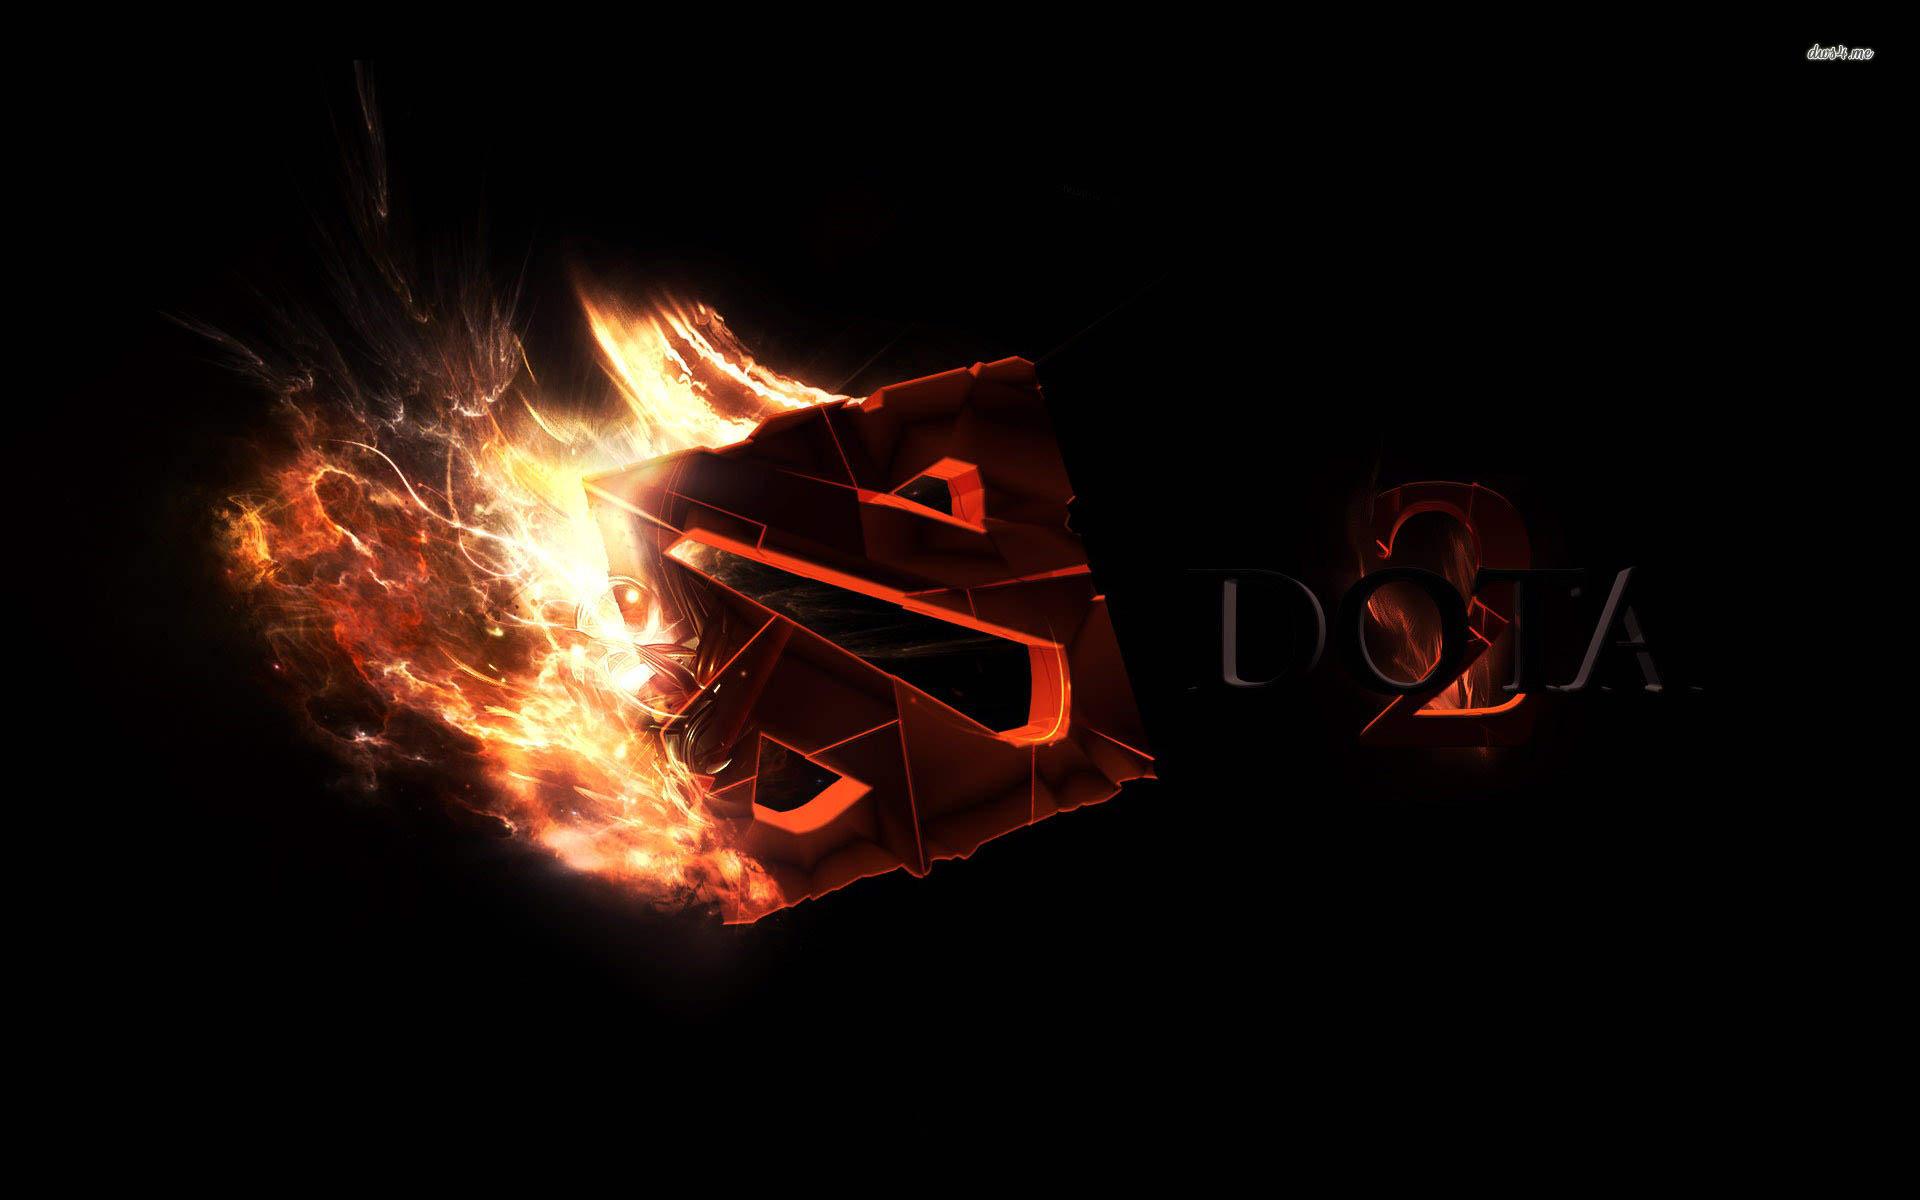 fire dota 2 logo wallpaper